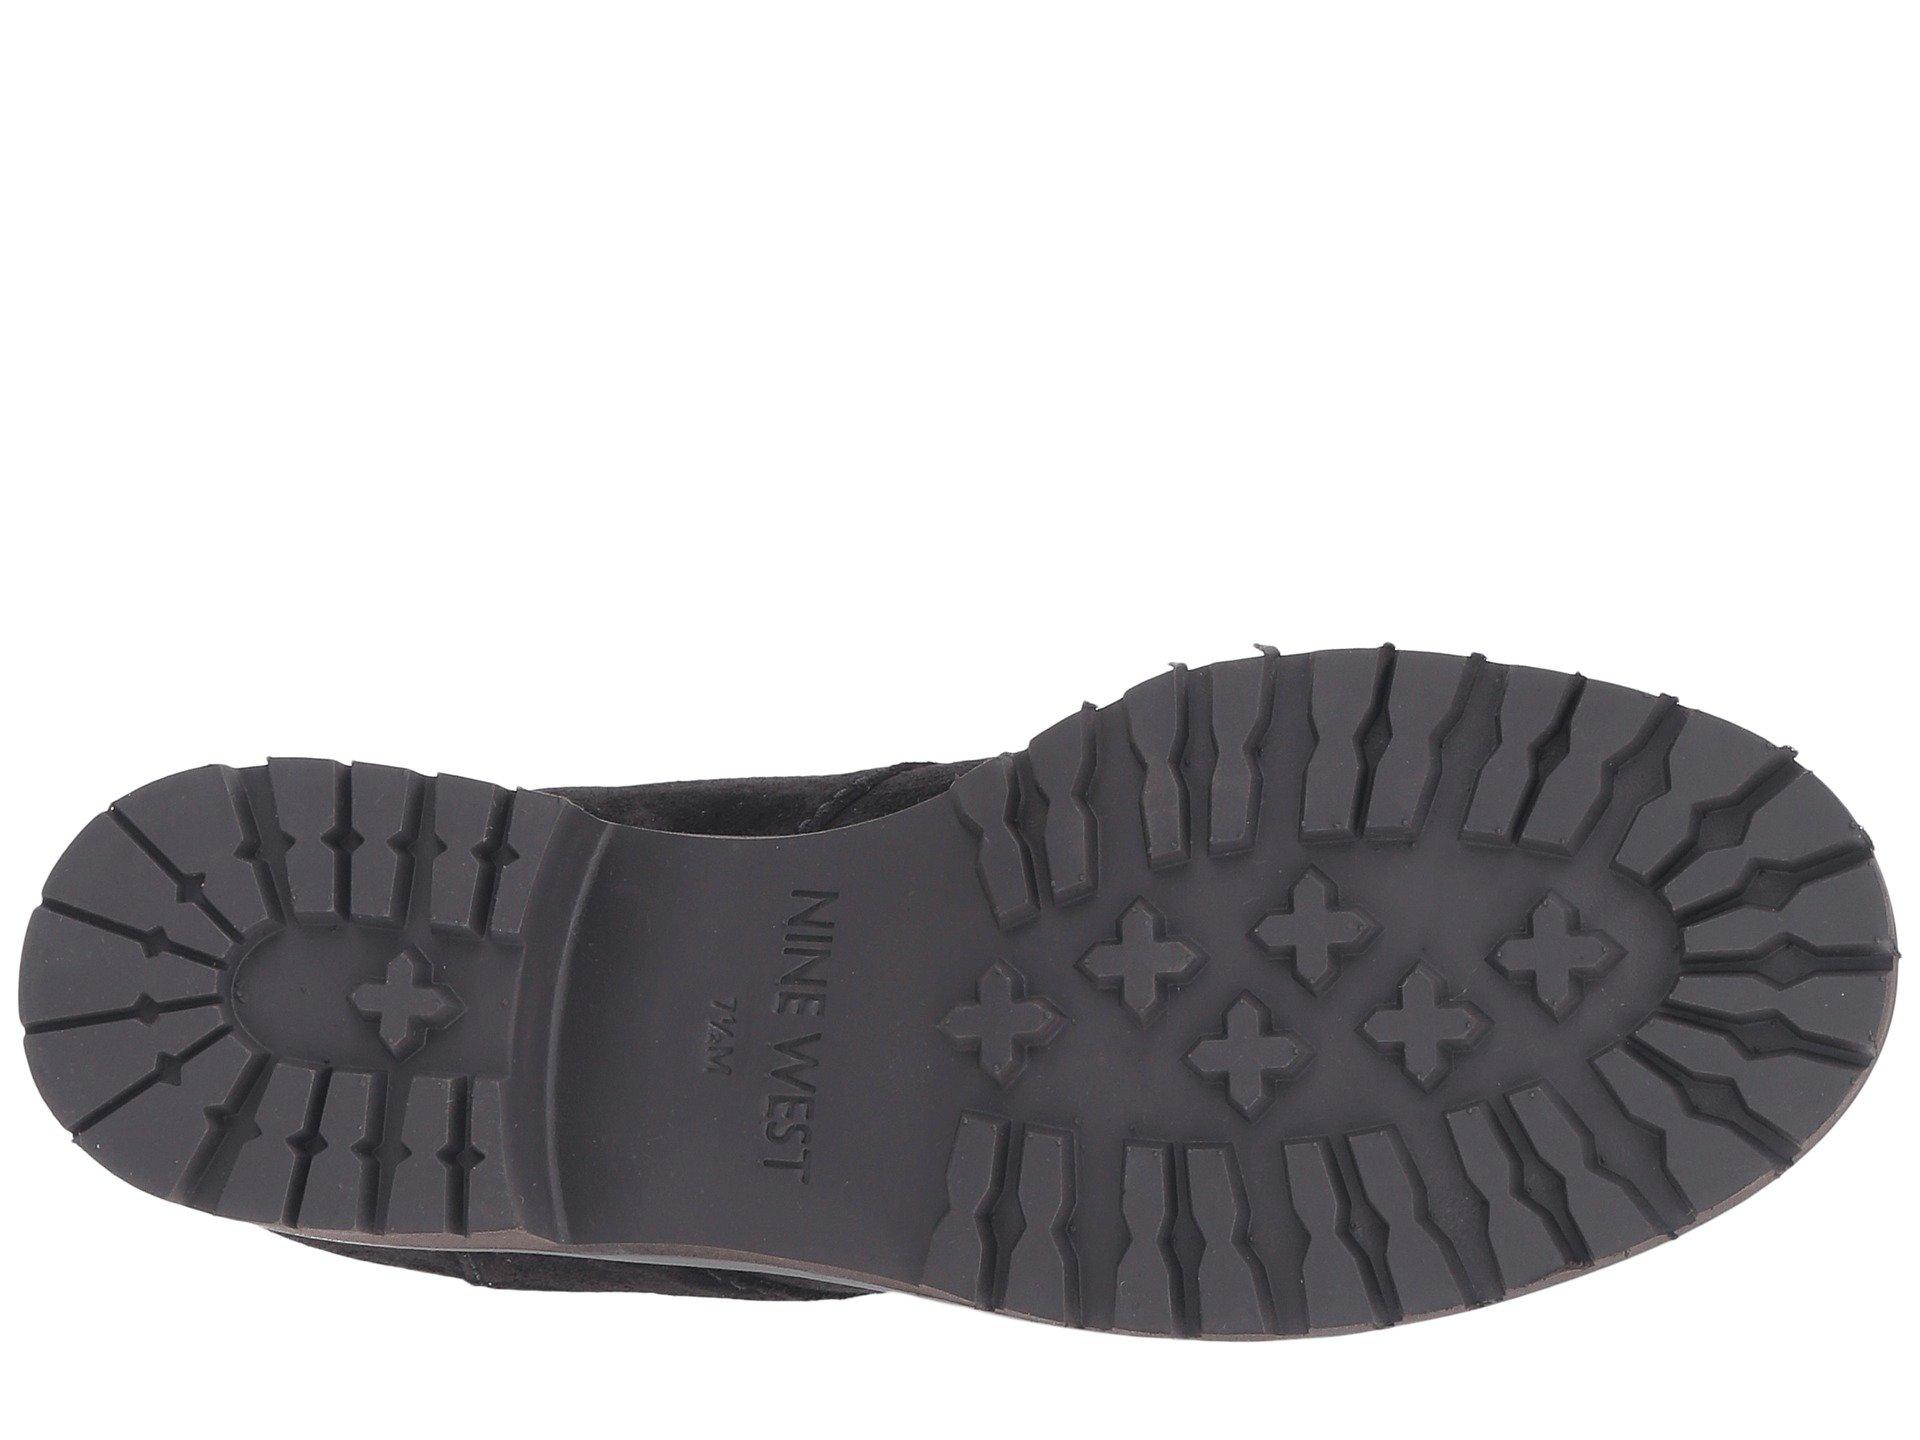 Nine West Mavira Women S Shoes Black Leather  M